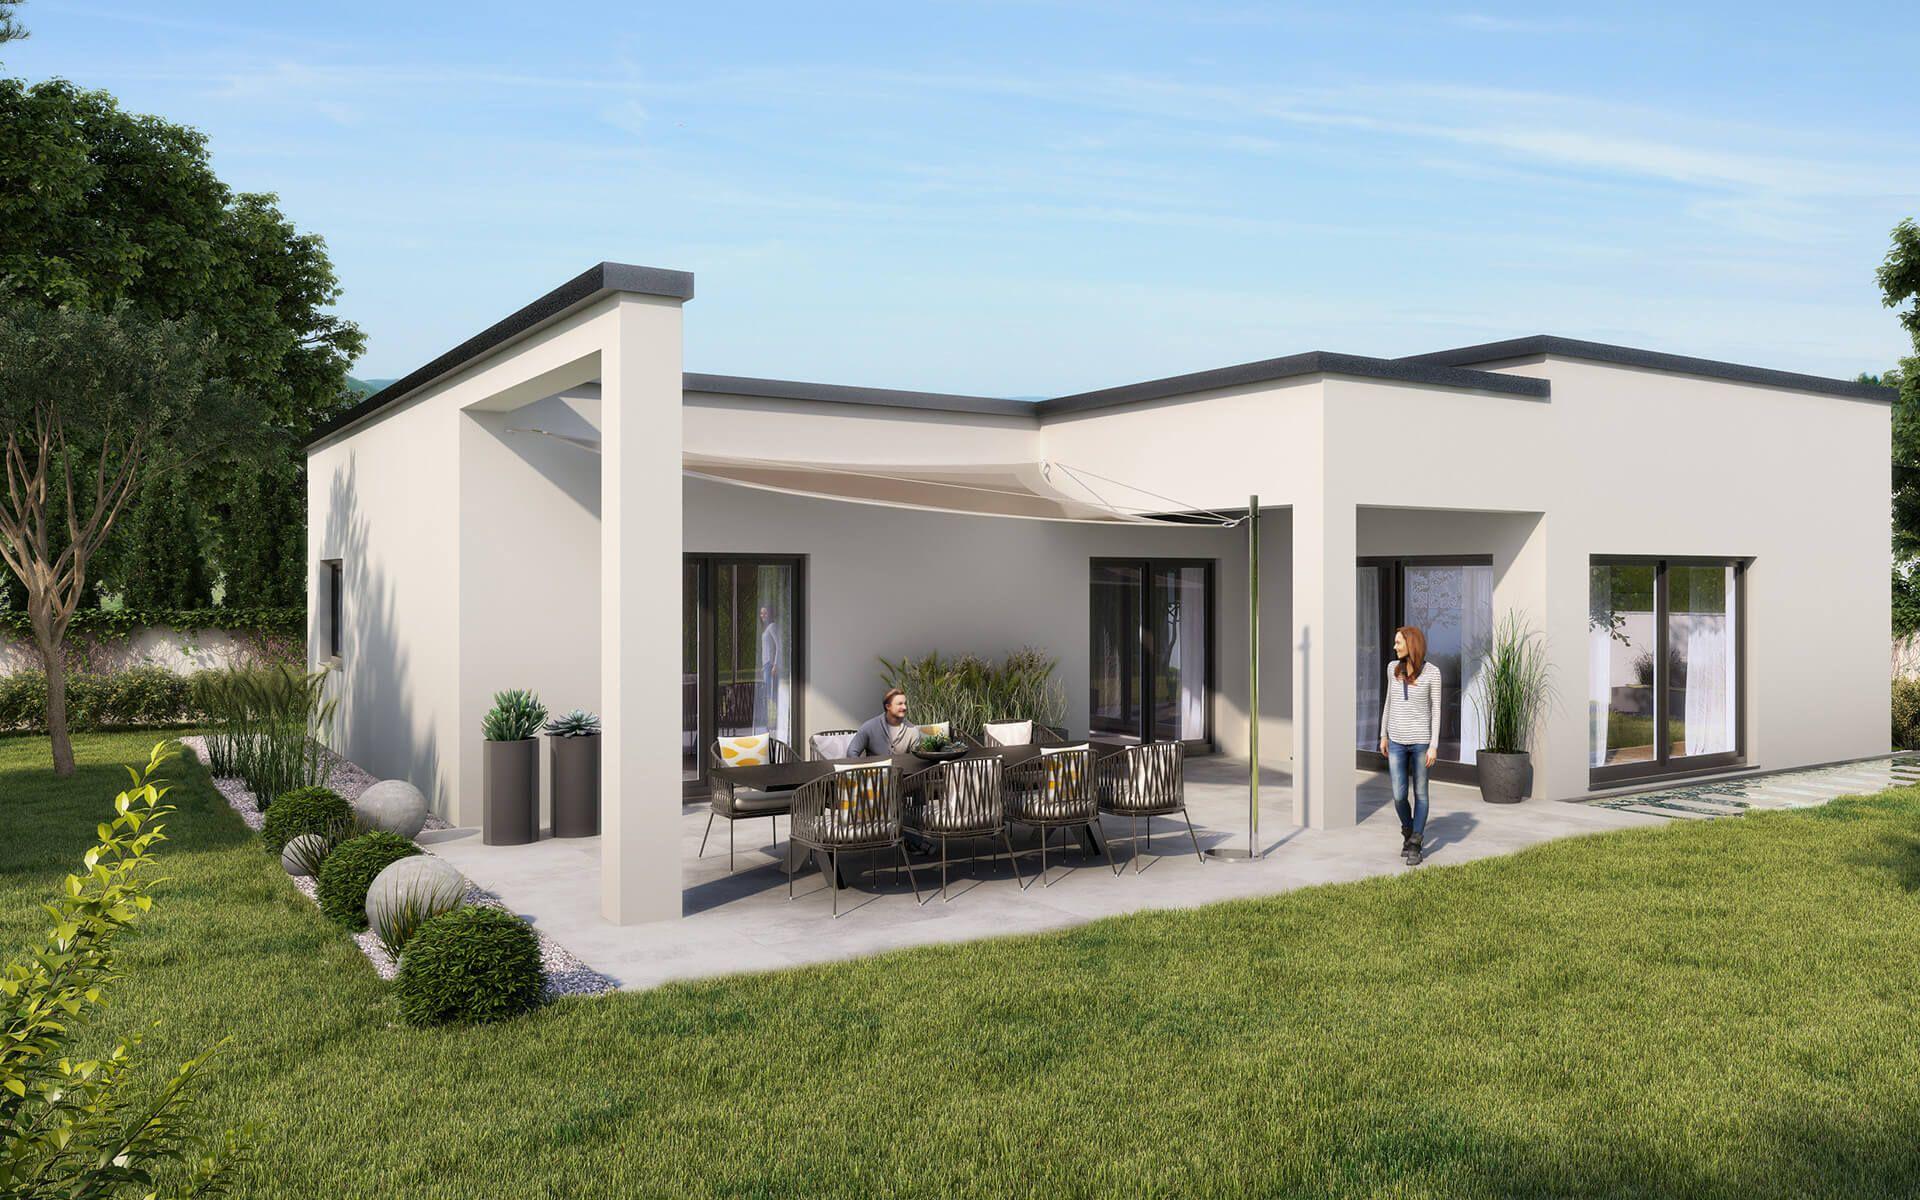 Wolf Haus Bungalow Elegance Fertighaus Preise In 2020 Fertighaus Bungalow Haus Bungalow